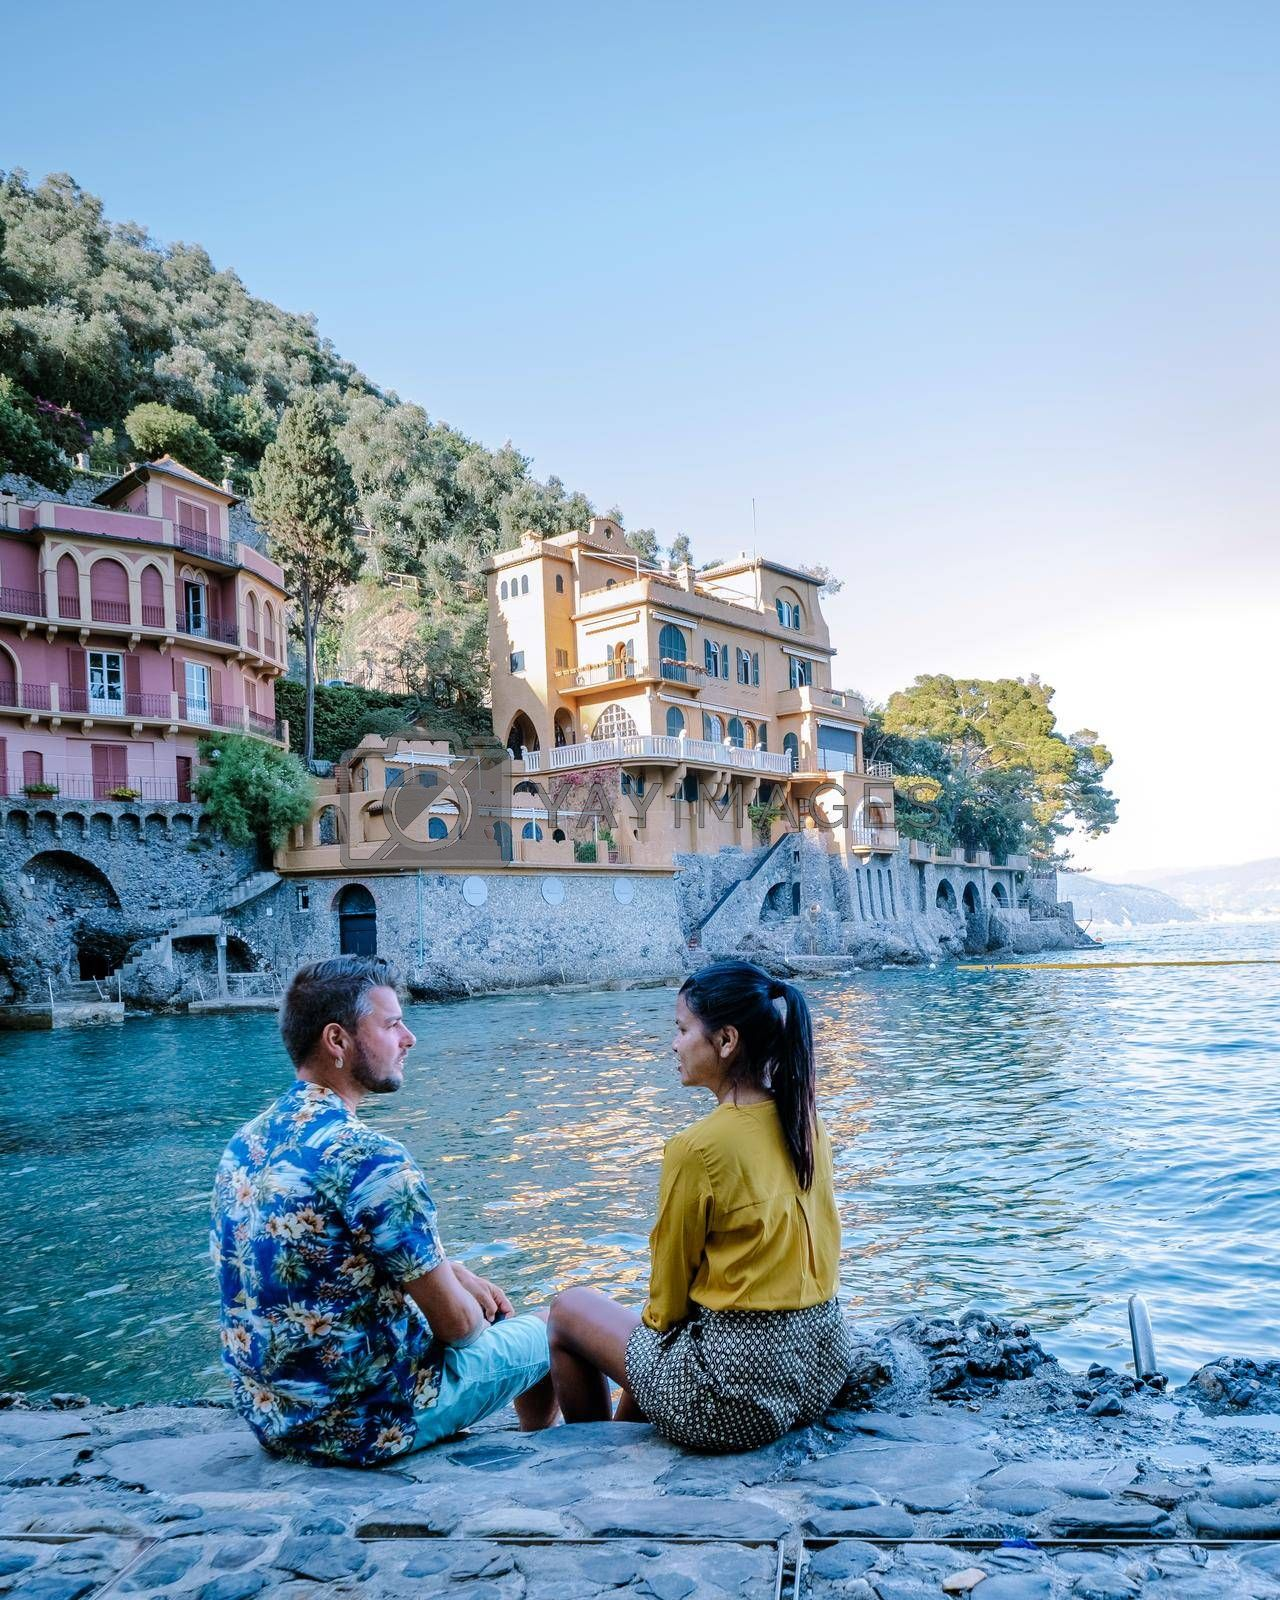 couple on vacation ligurian coast Italy,Portofino famous village bay, Italy Europe colorful village Ligurian coast